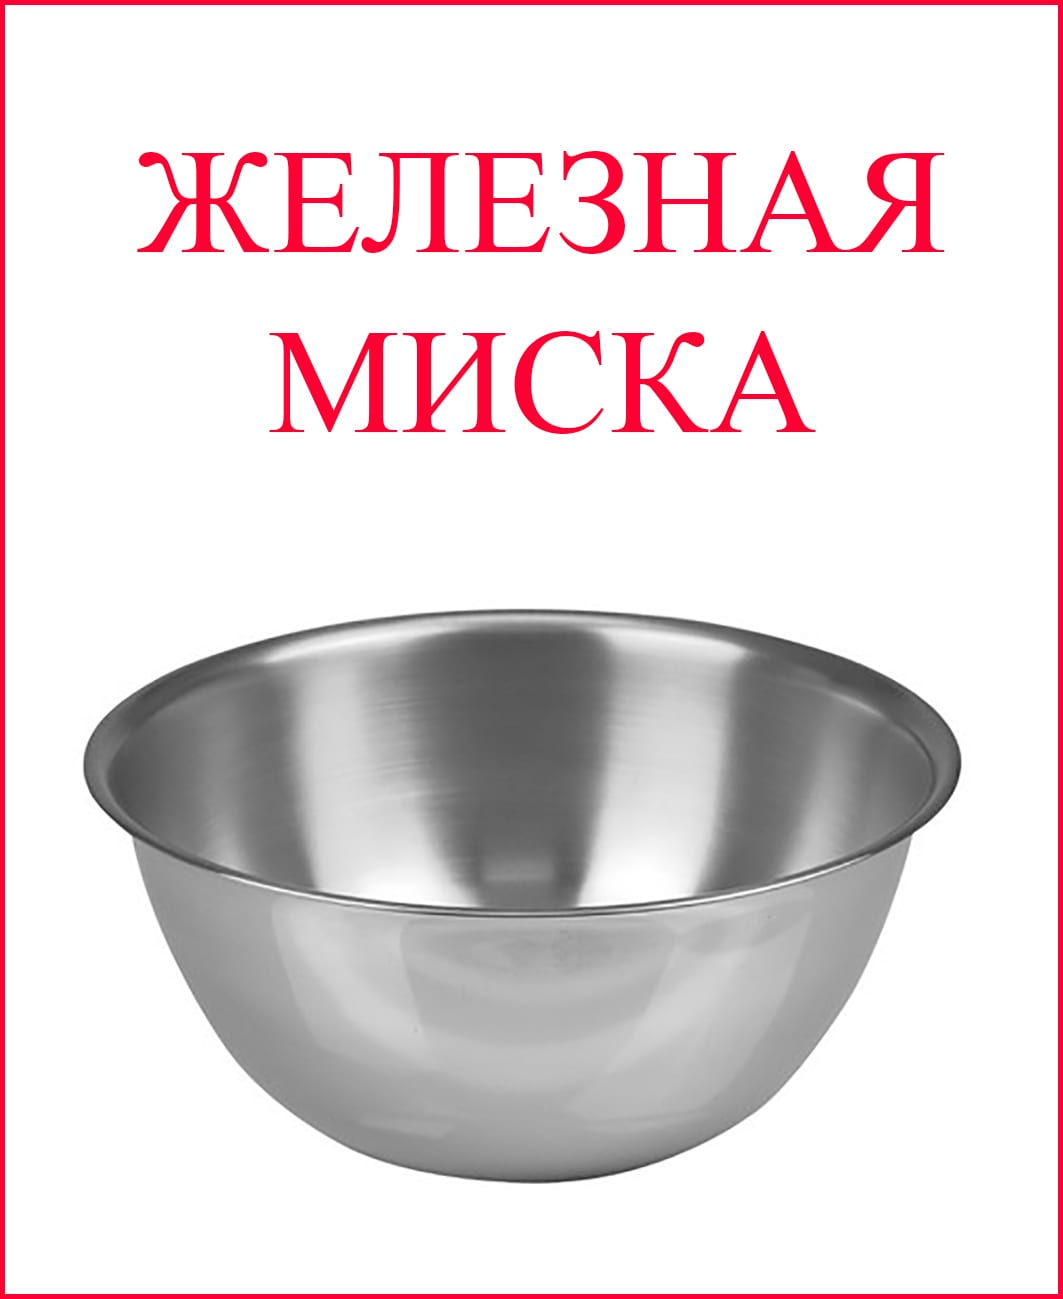 железная миска